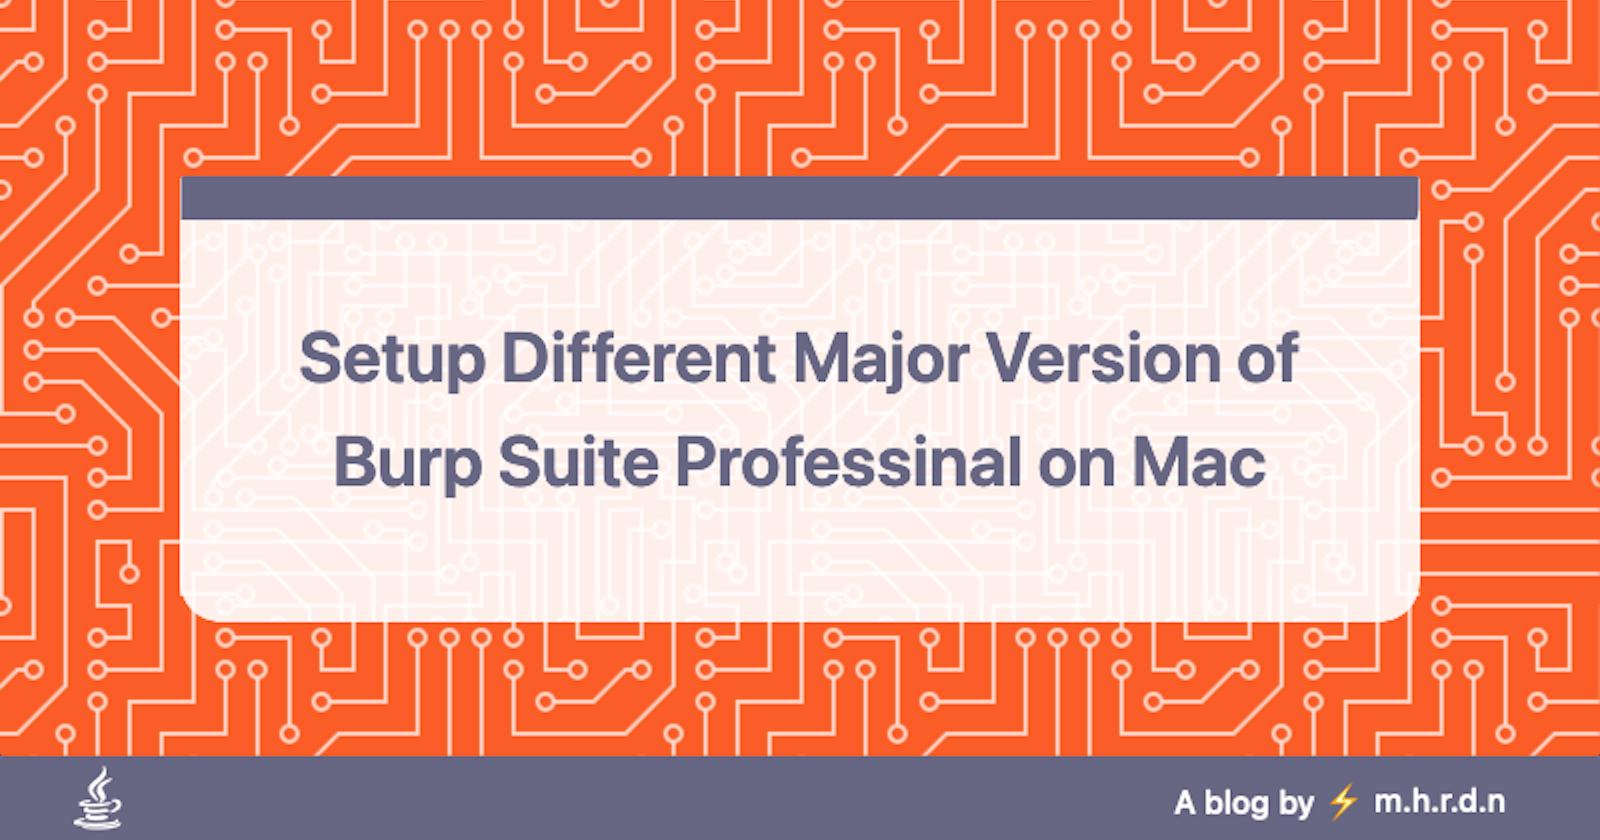 Setup Different Major Version of Burp Suite Professional on Mac